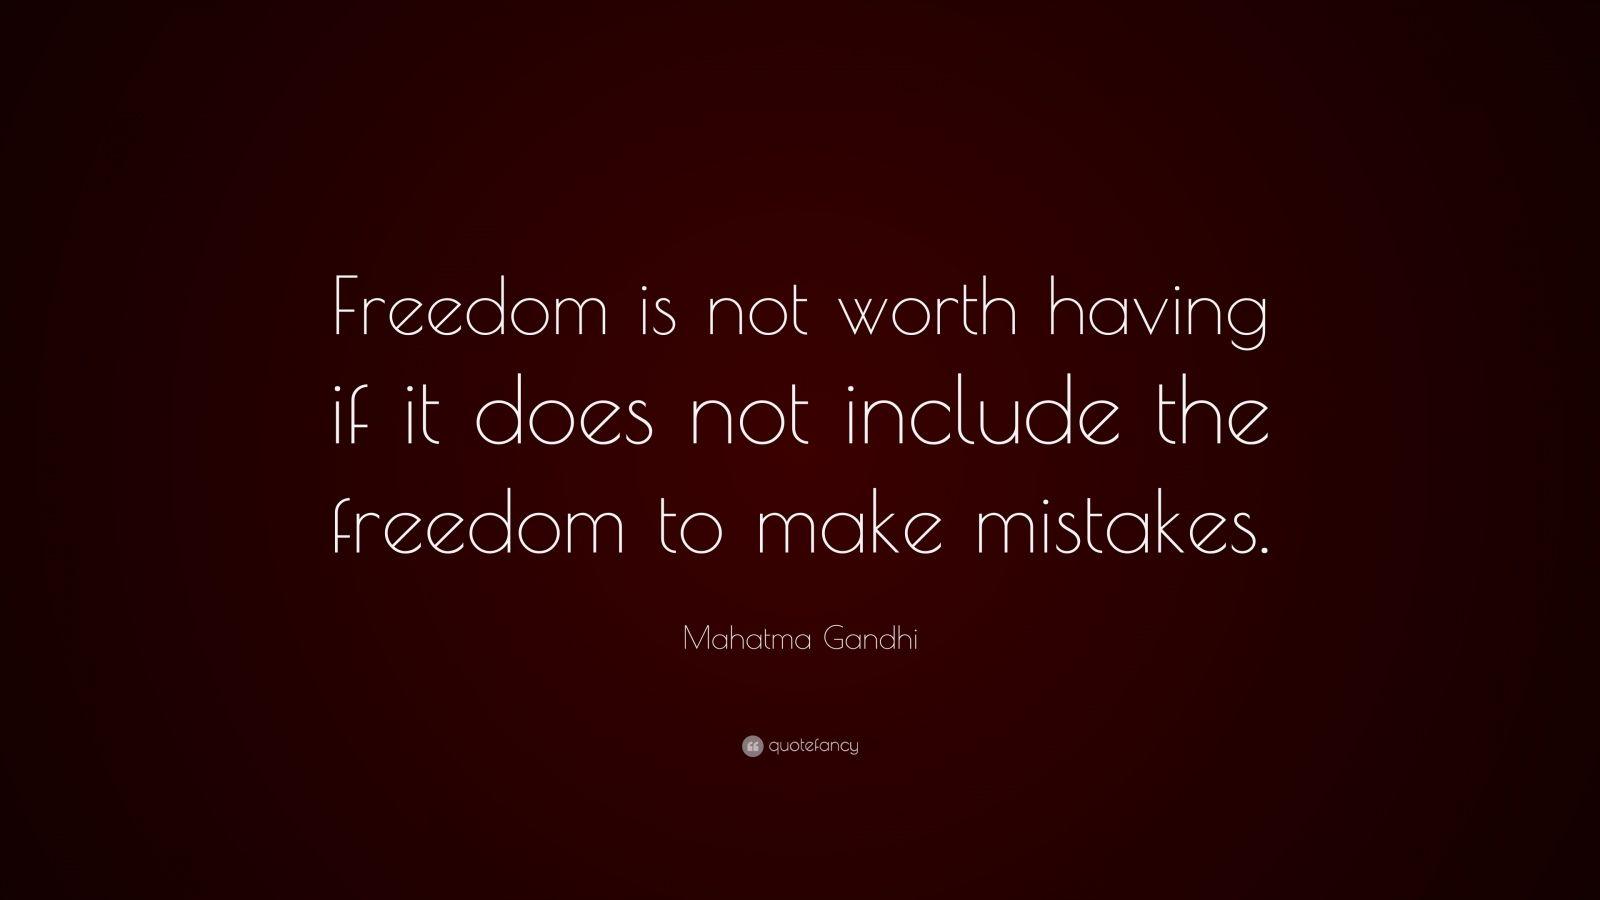 Mahatma Gandhi Quotes Freedom